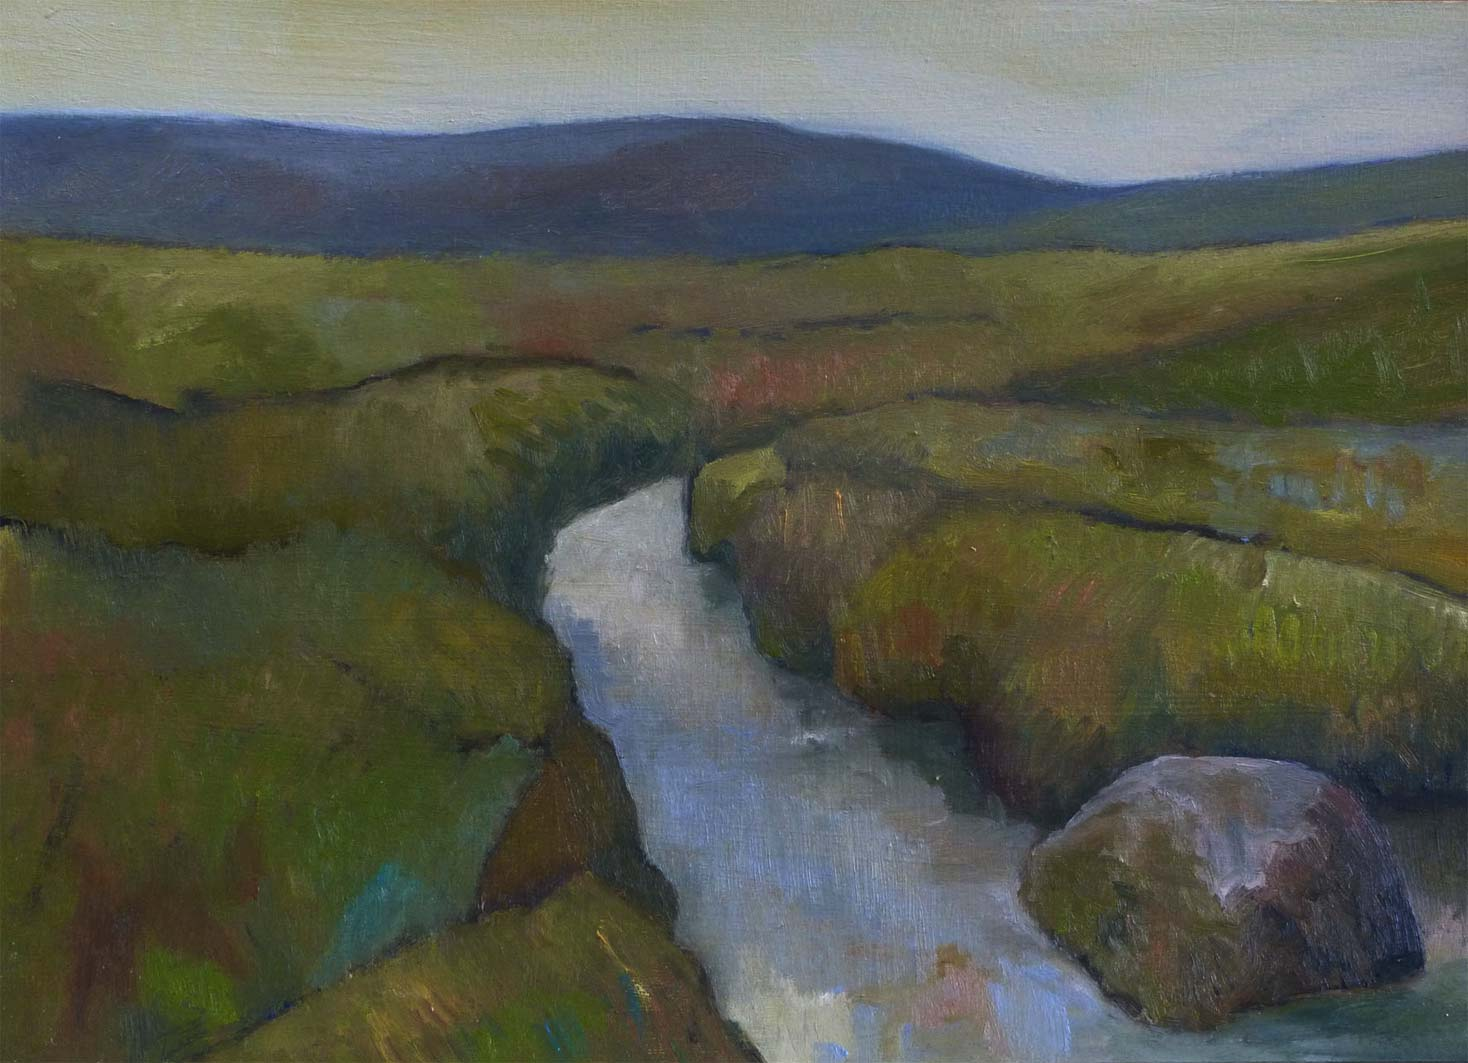 Dartmoor Landscape, oil on paper, private collection